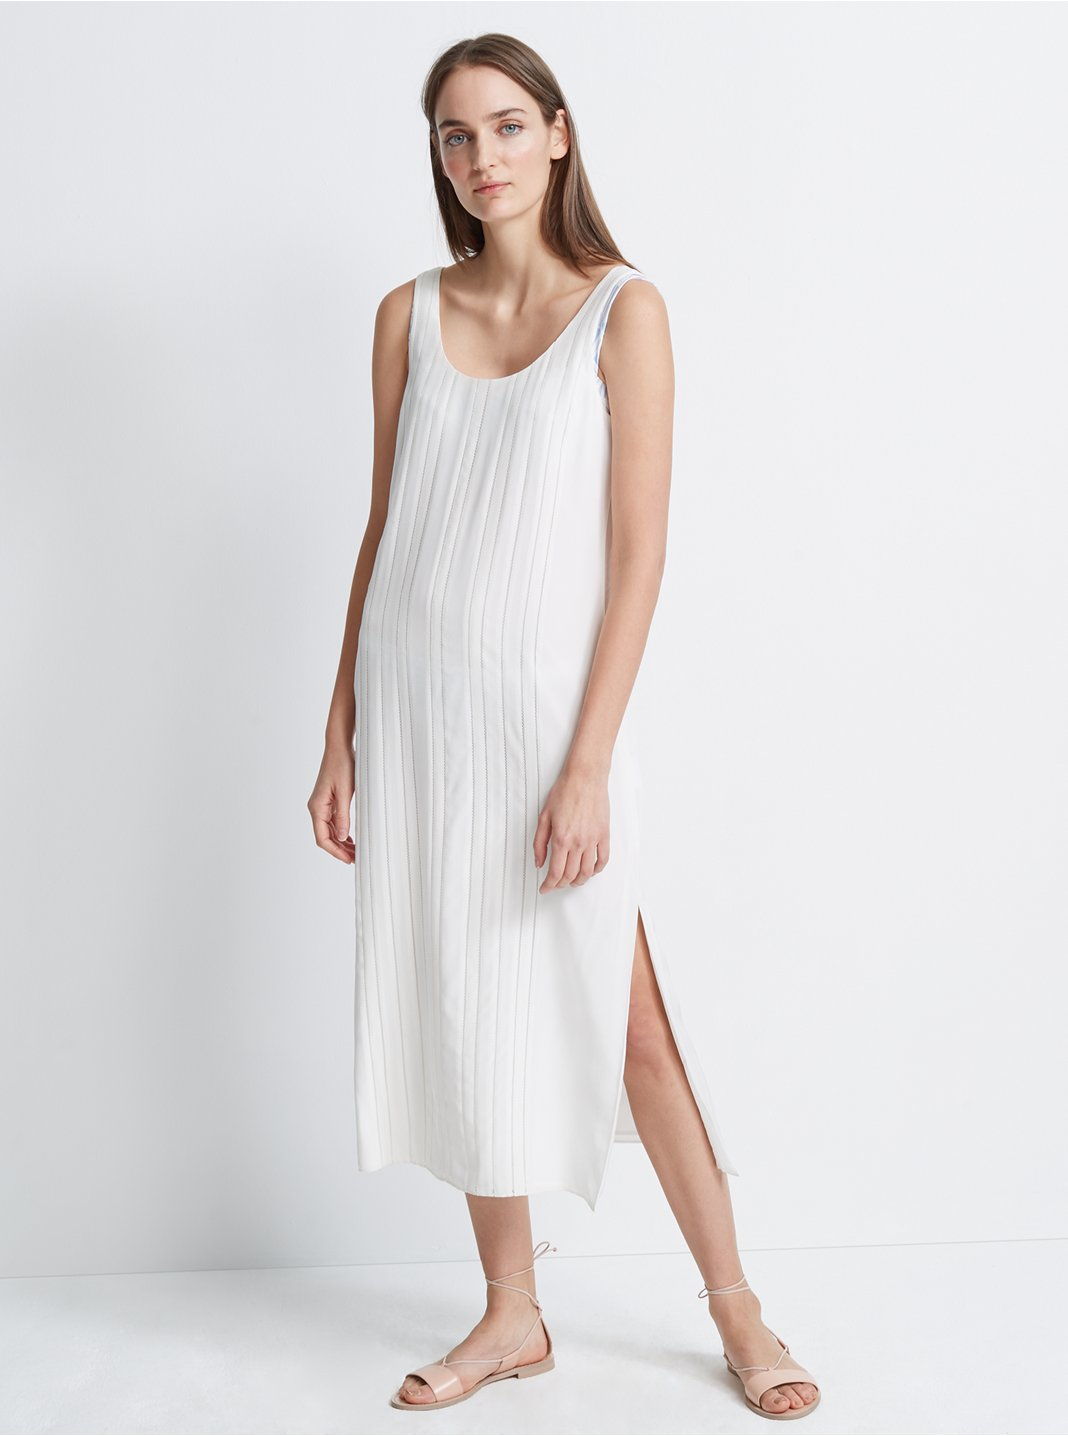 55f01fded19 Lorrenah Silk Dress